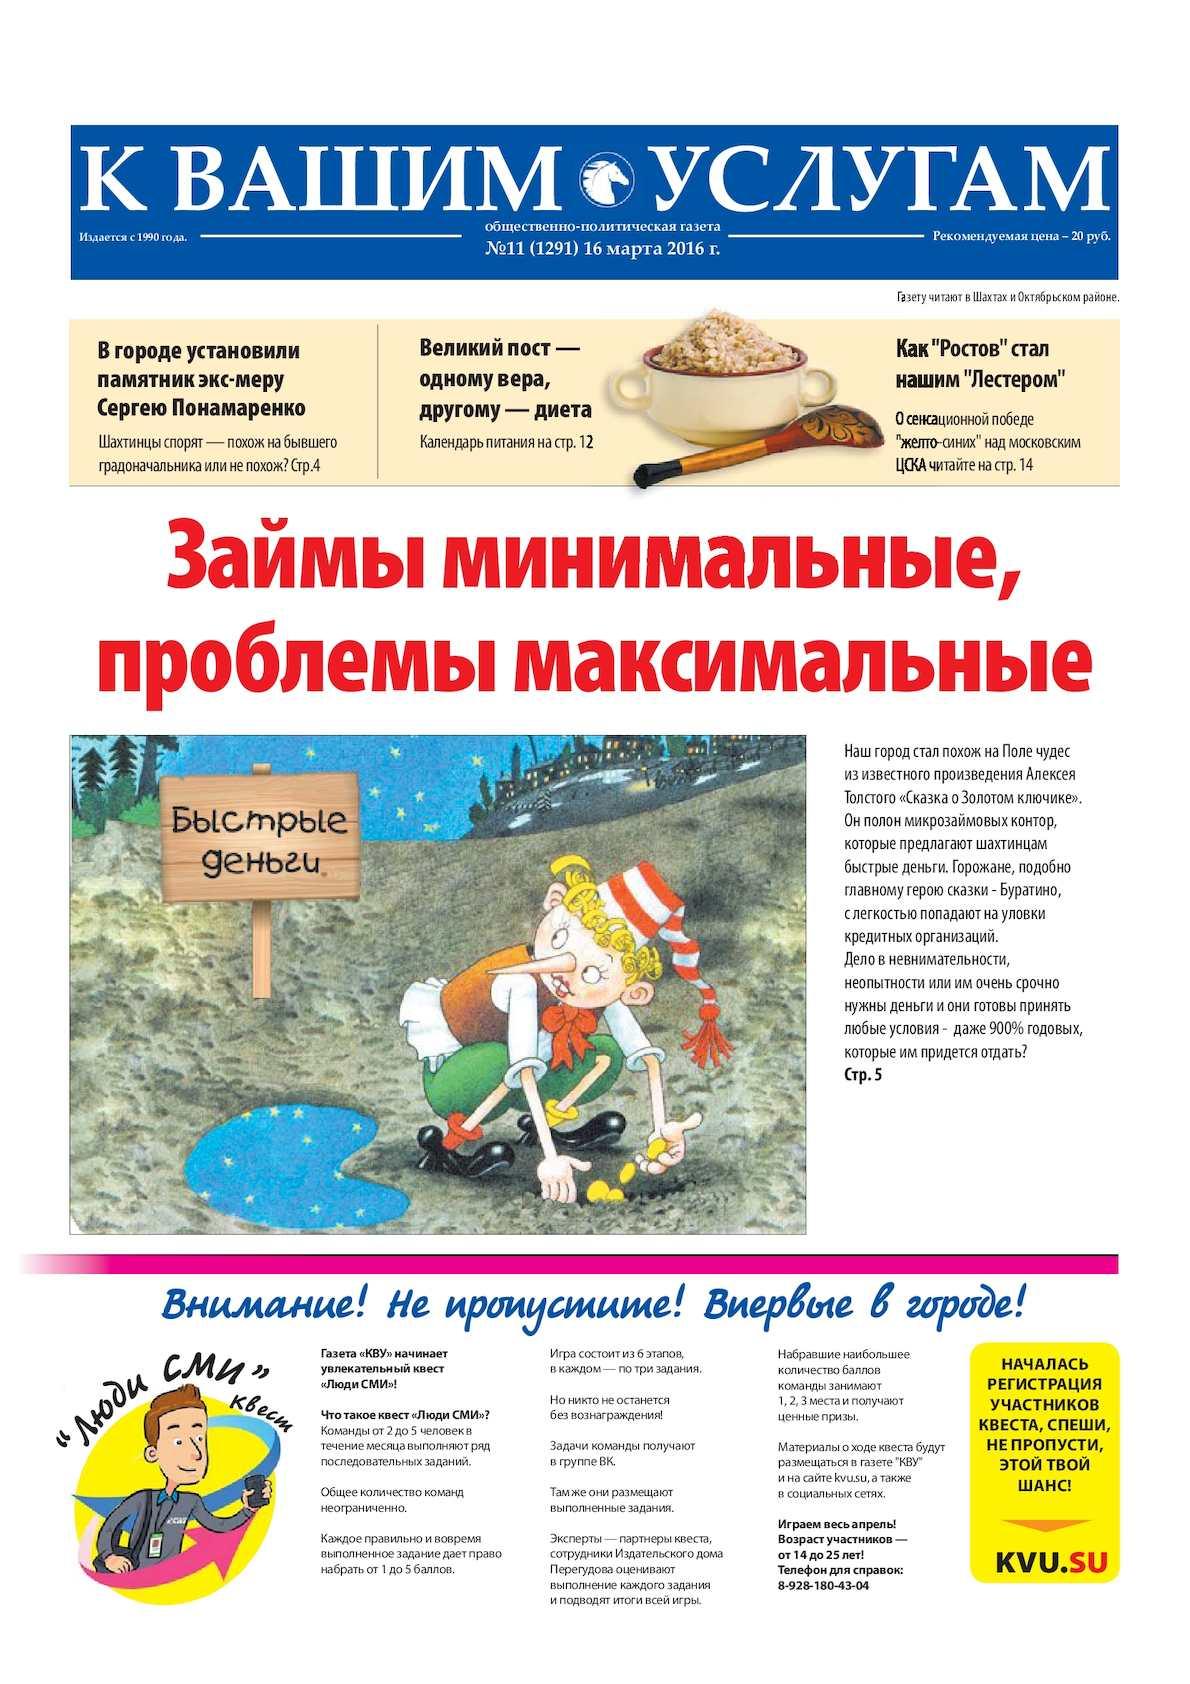 Calaméo - Газета КВУ №11 от 16 марта 2016 г. d418325dd53a0